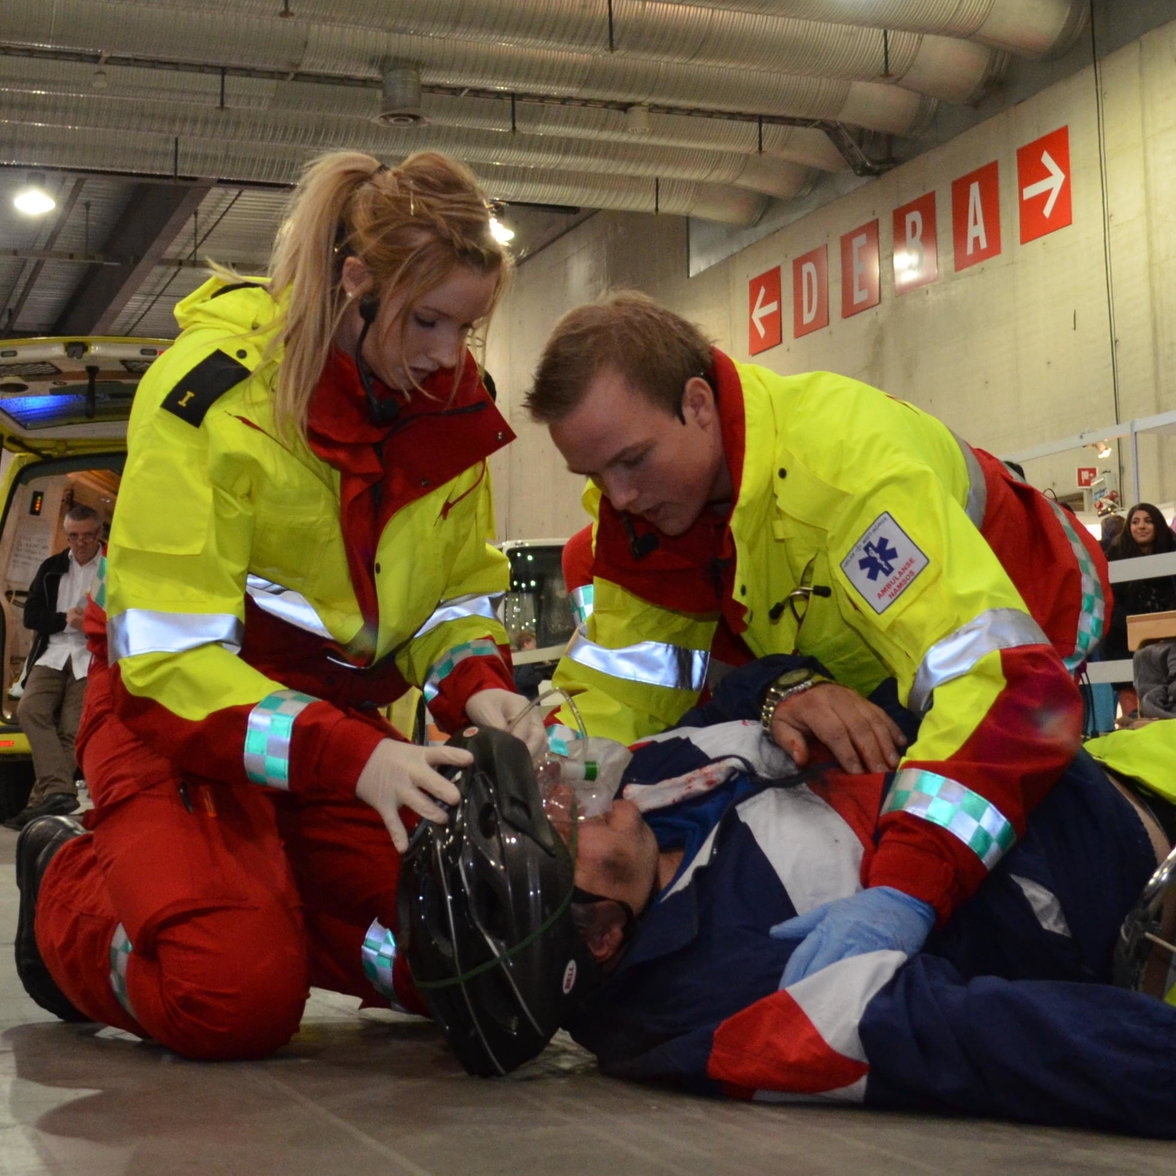 ambulansepersonell